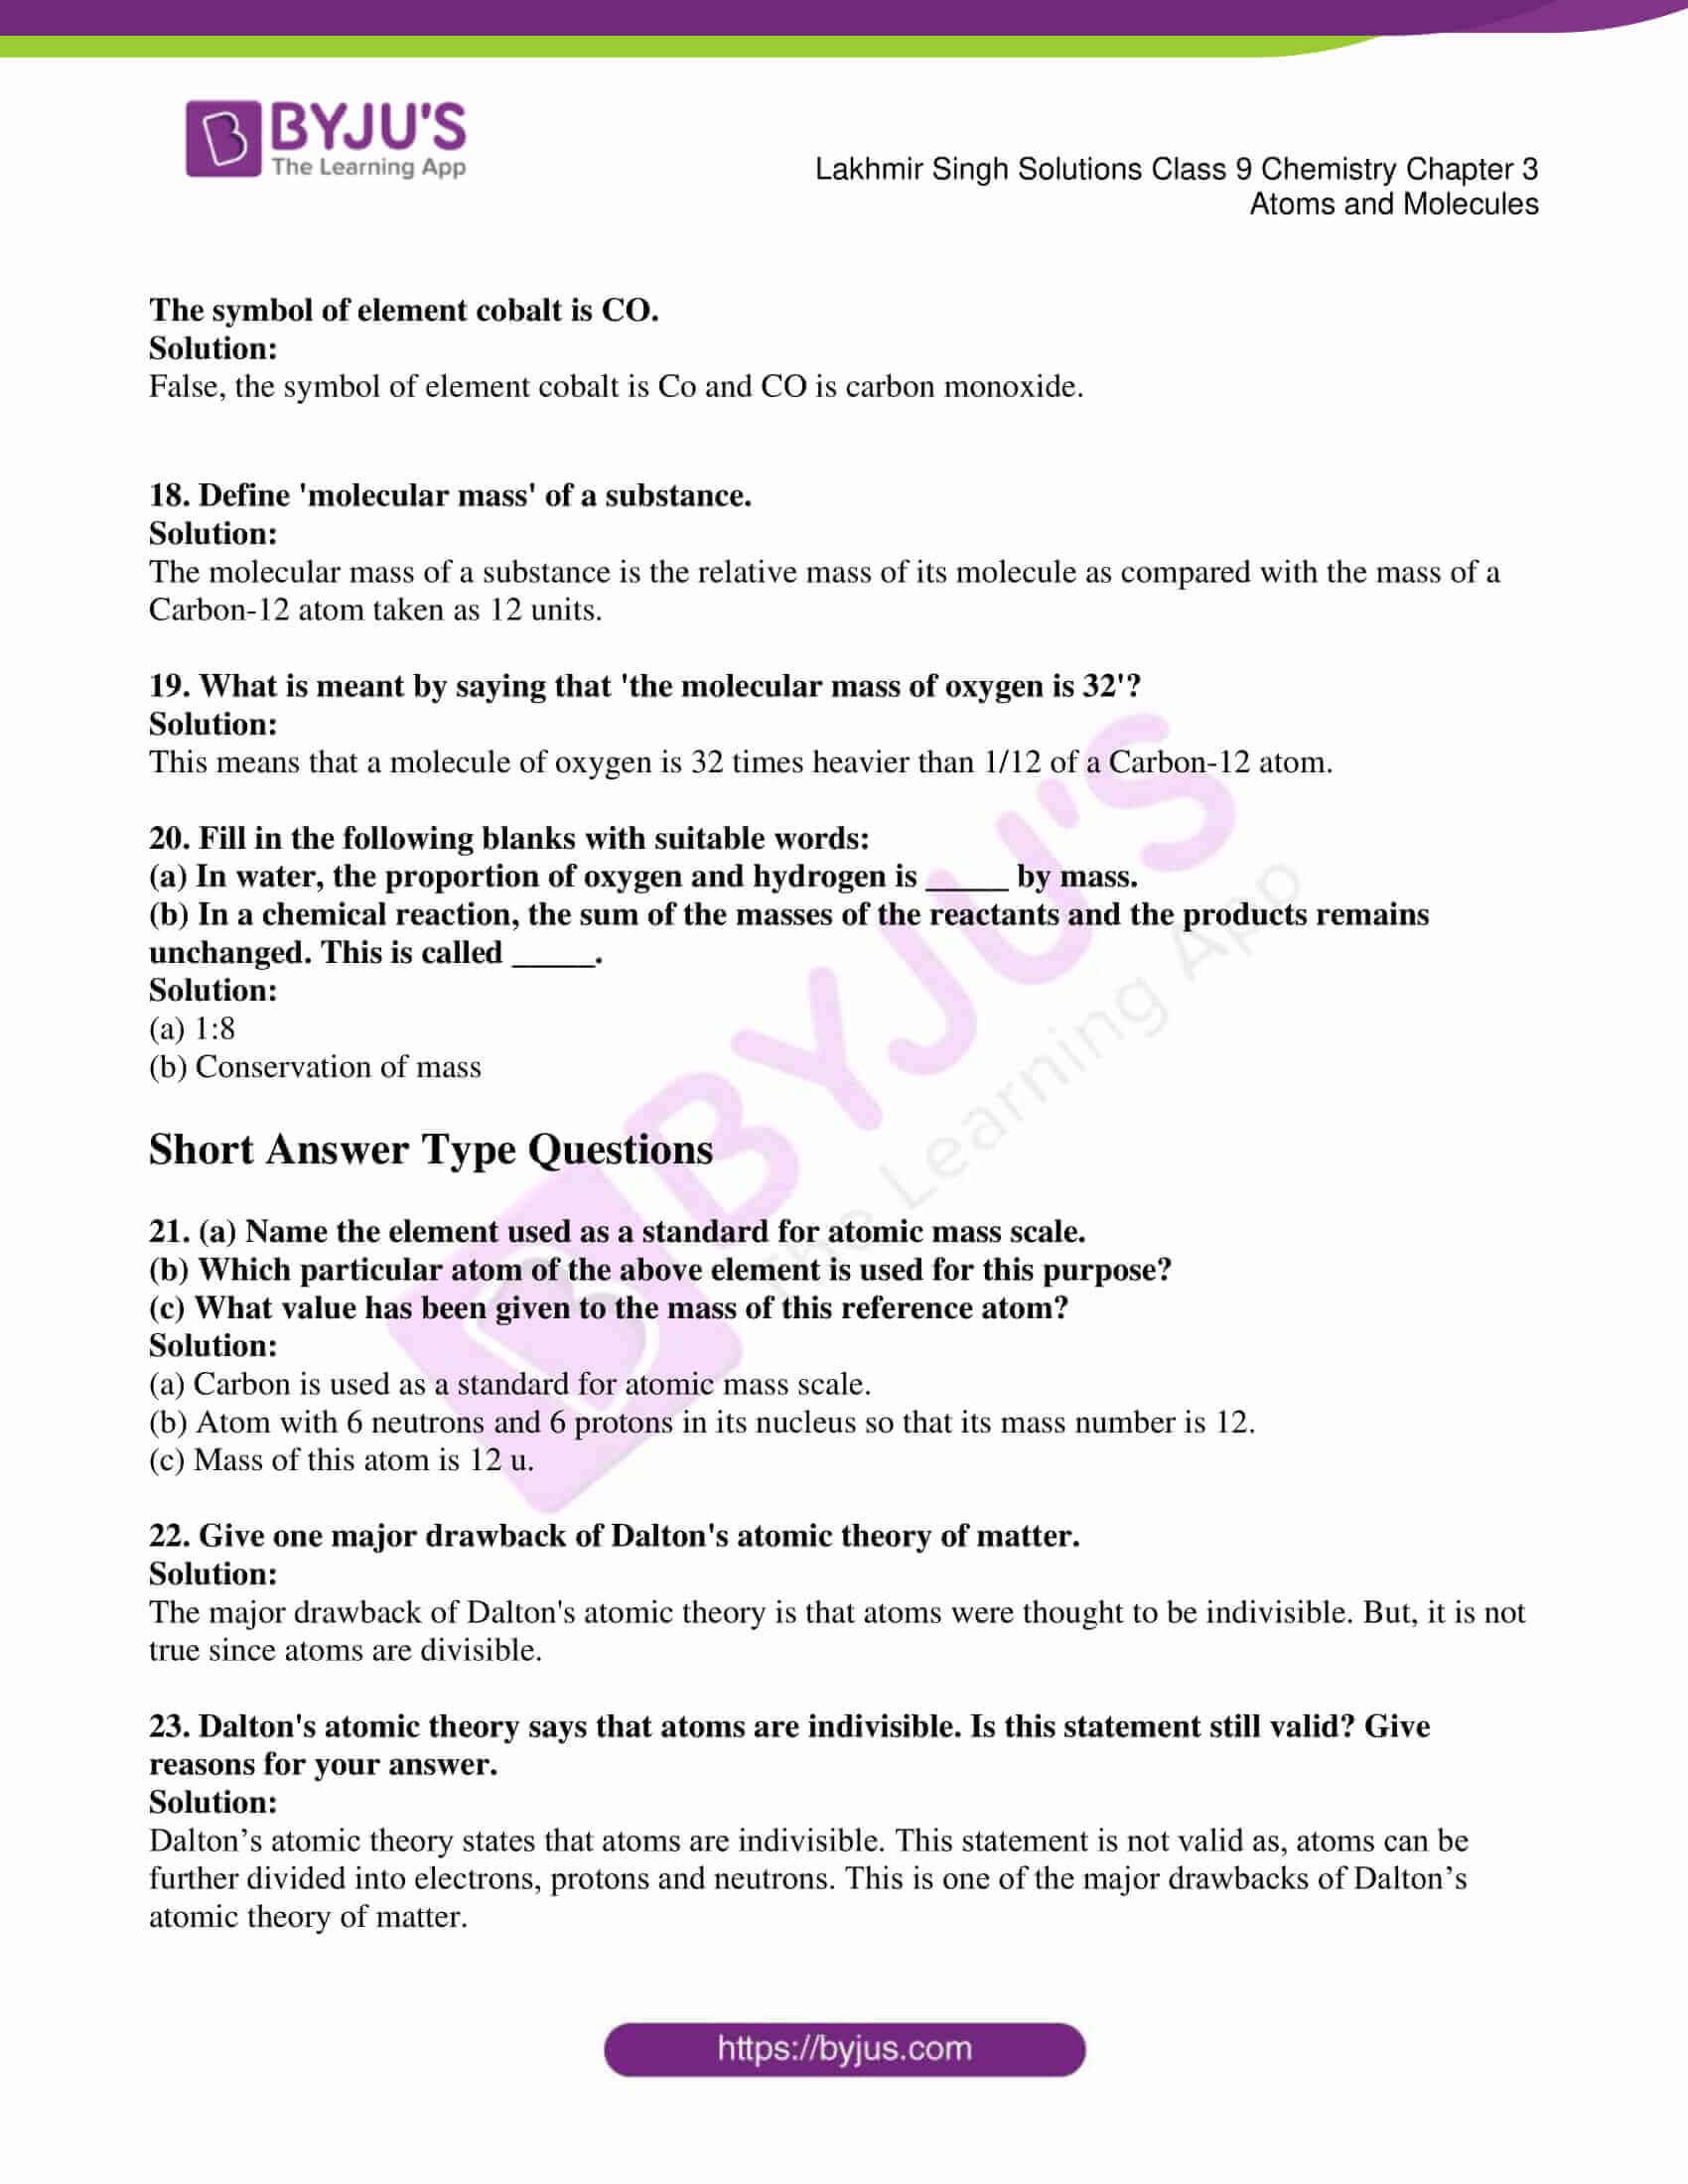 lakhmir singh solutions class 9 chemistry chapter 3 03